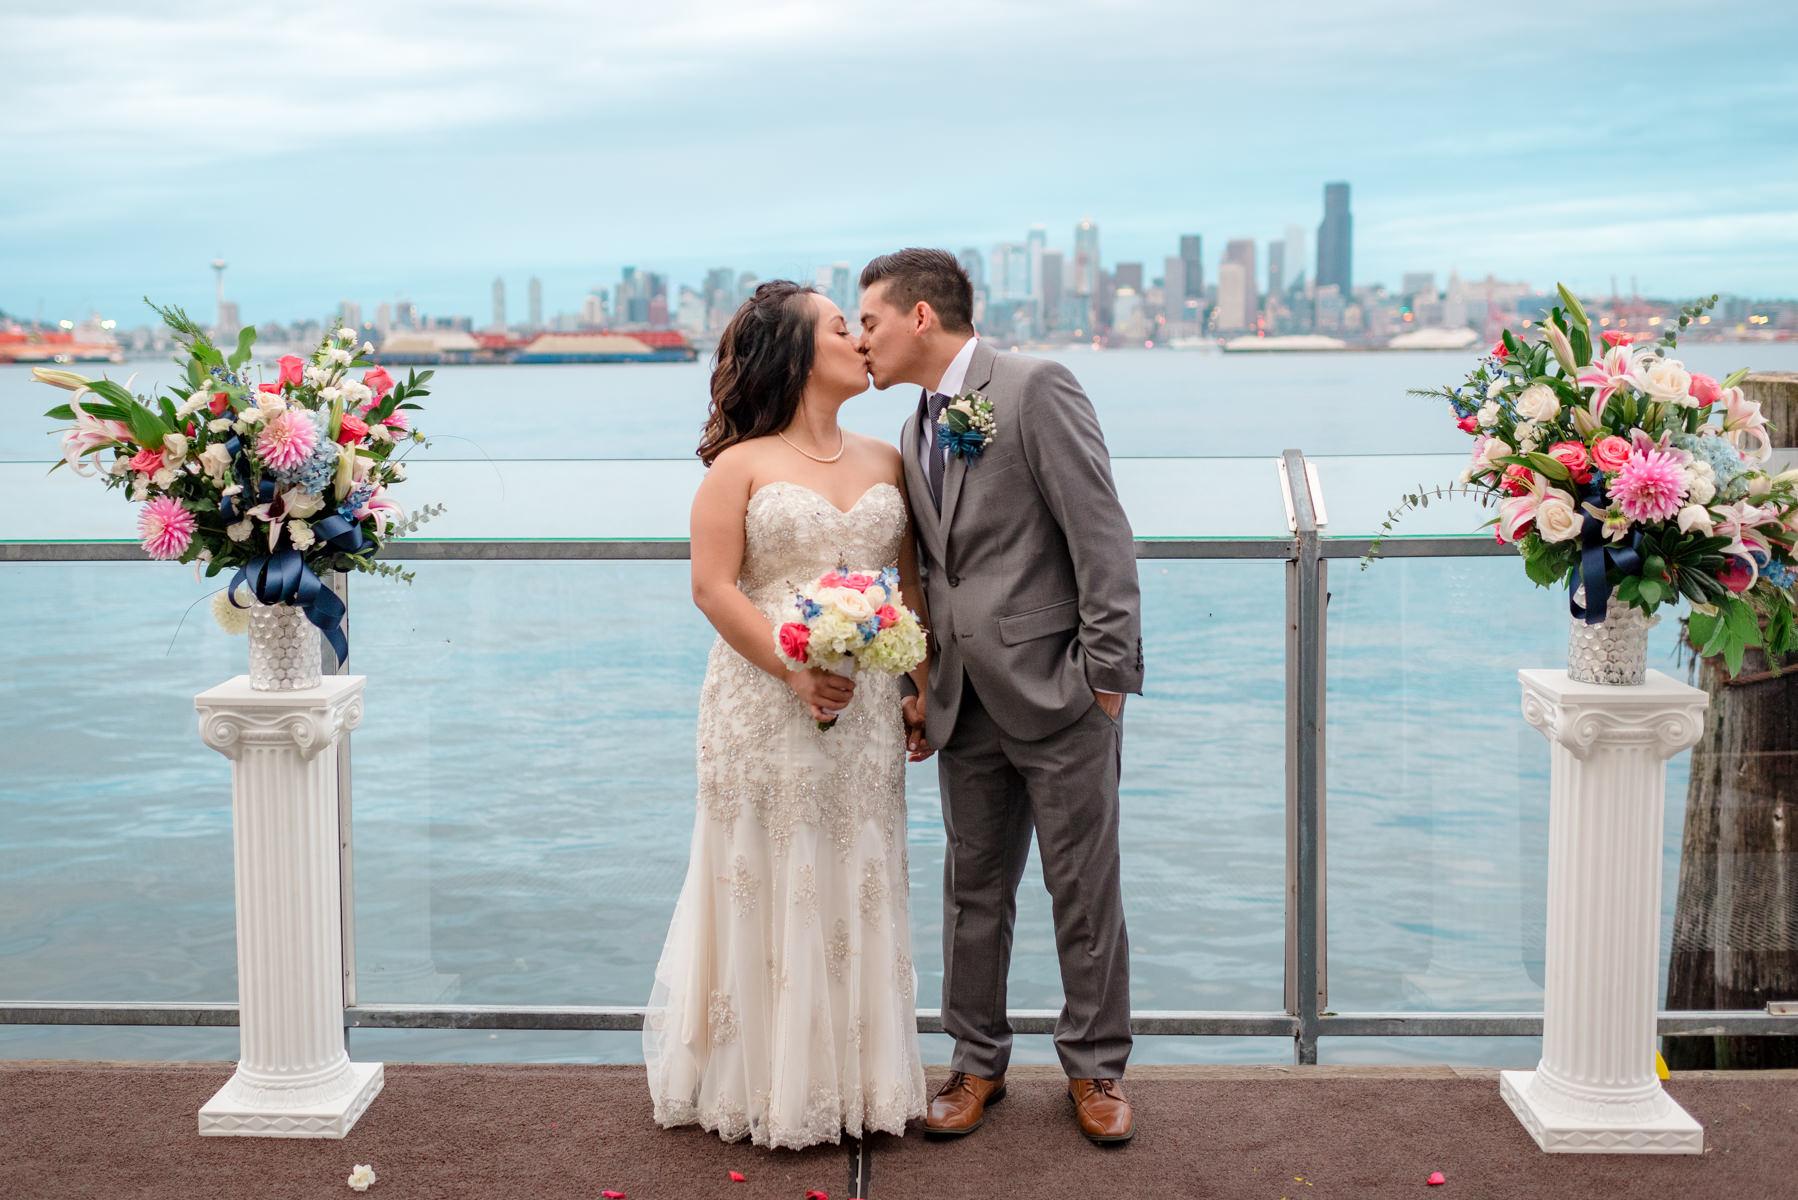 Andrew Tat - Documentary Wedding Photography - Salty's - Seattle, Washington -Mark & Marcy - 20.jpg